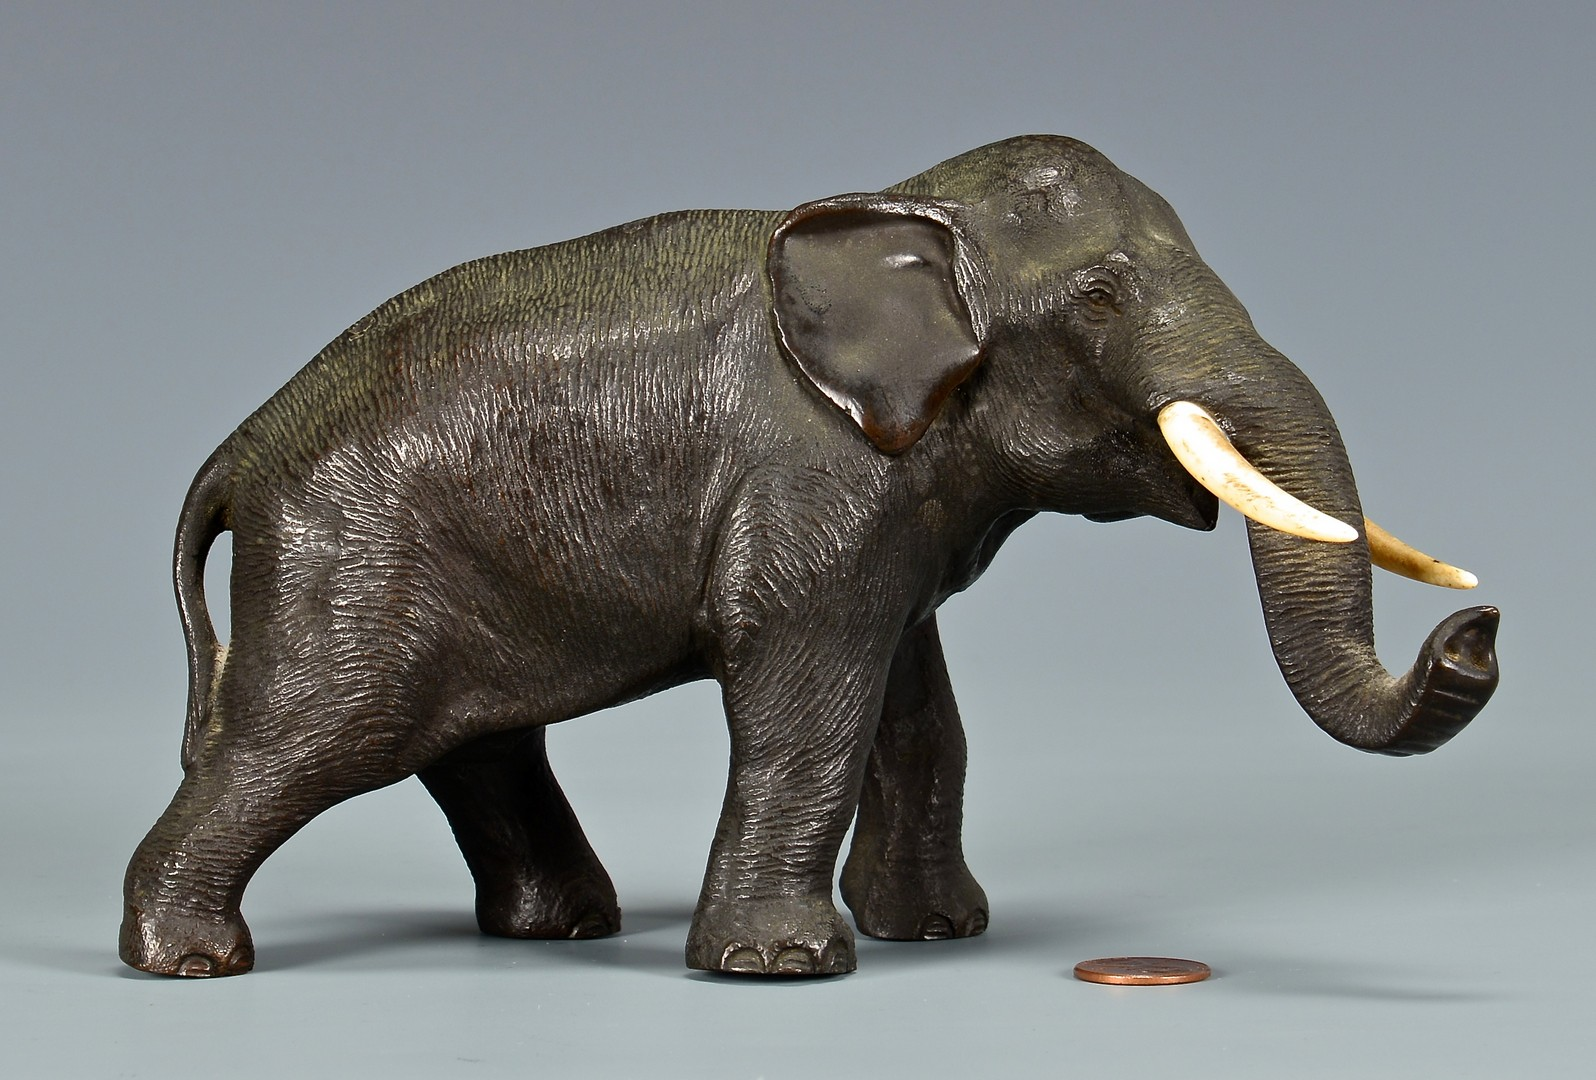 Lot 4010085: Japanese Meiji Bronze & Ivory Elephant, Late 19th/Early 20th Century